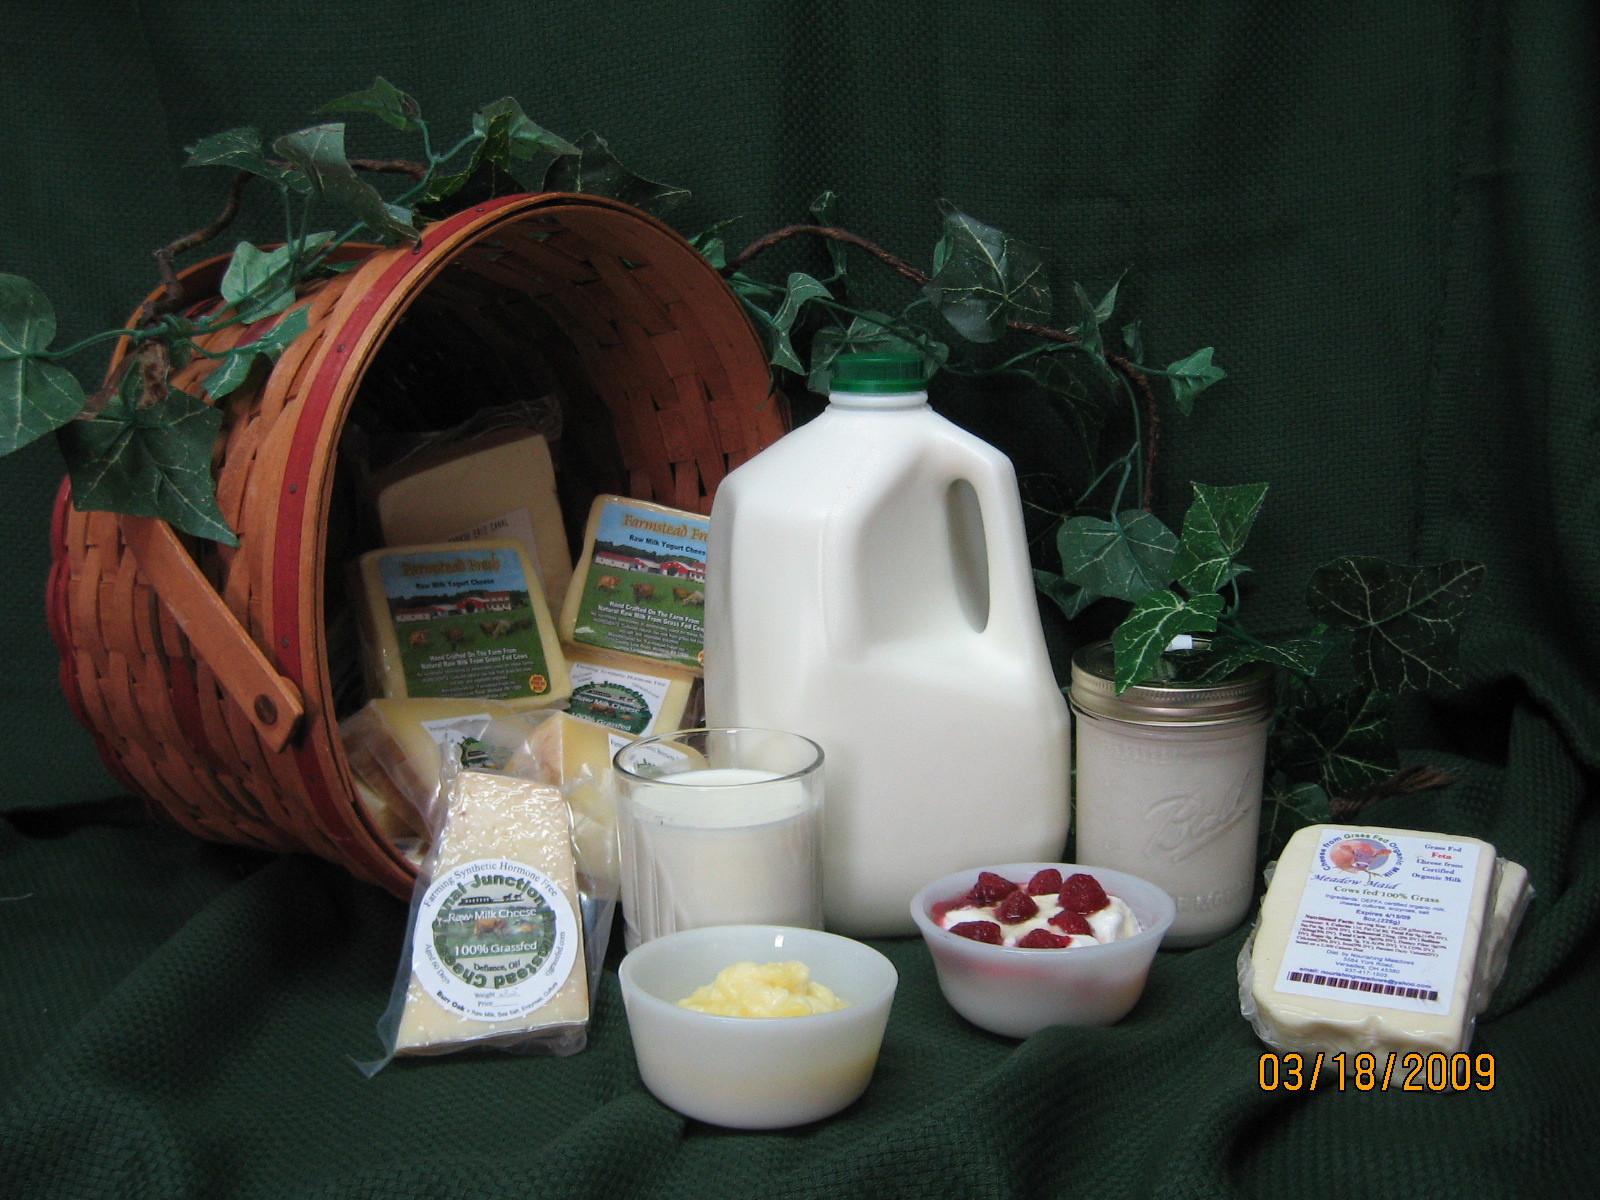 Raw Jersey Milk - Gallon Plastic